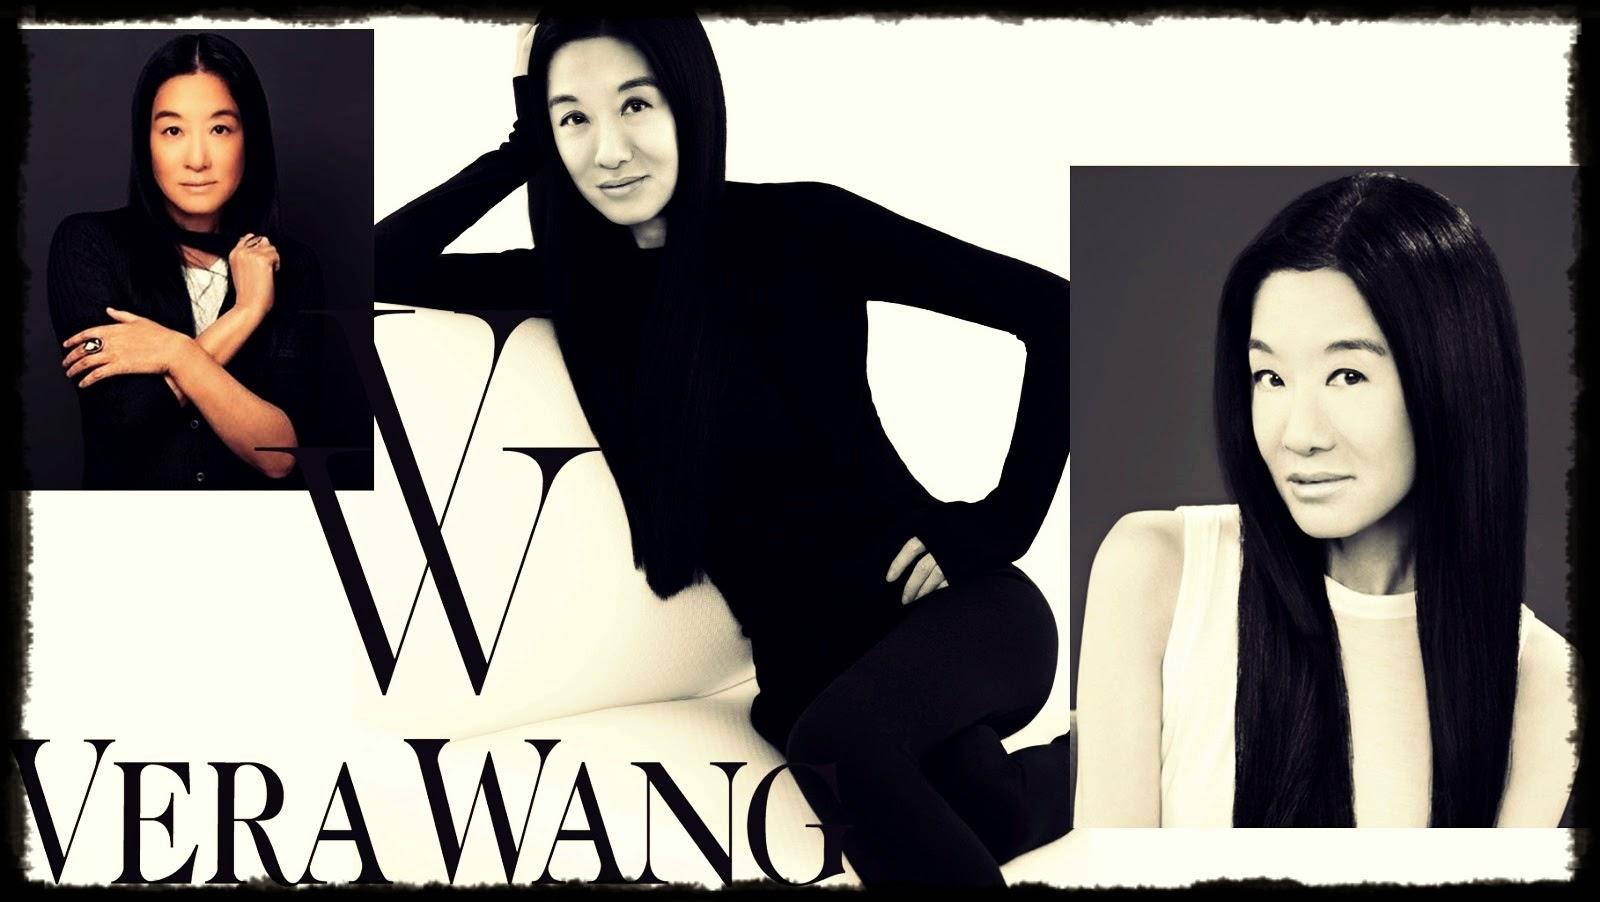 vera ellen wang Vera ellen wang (cheenese: 王薇薇 pinyin: wáng wēiwei, mandarin pronunciation: [u̯ɑ̌ŋ u̯éɪ̯u̯éɪ̯] born 27 juin 1949) is an american fashion.